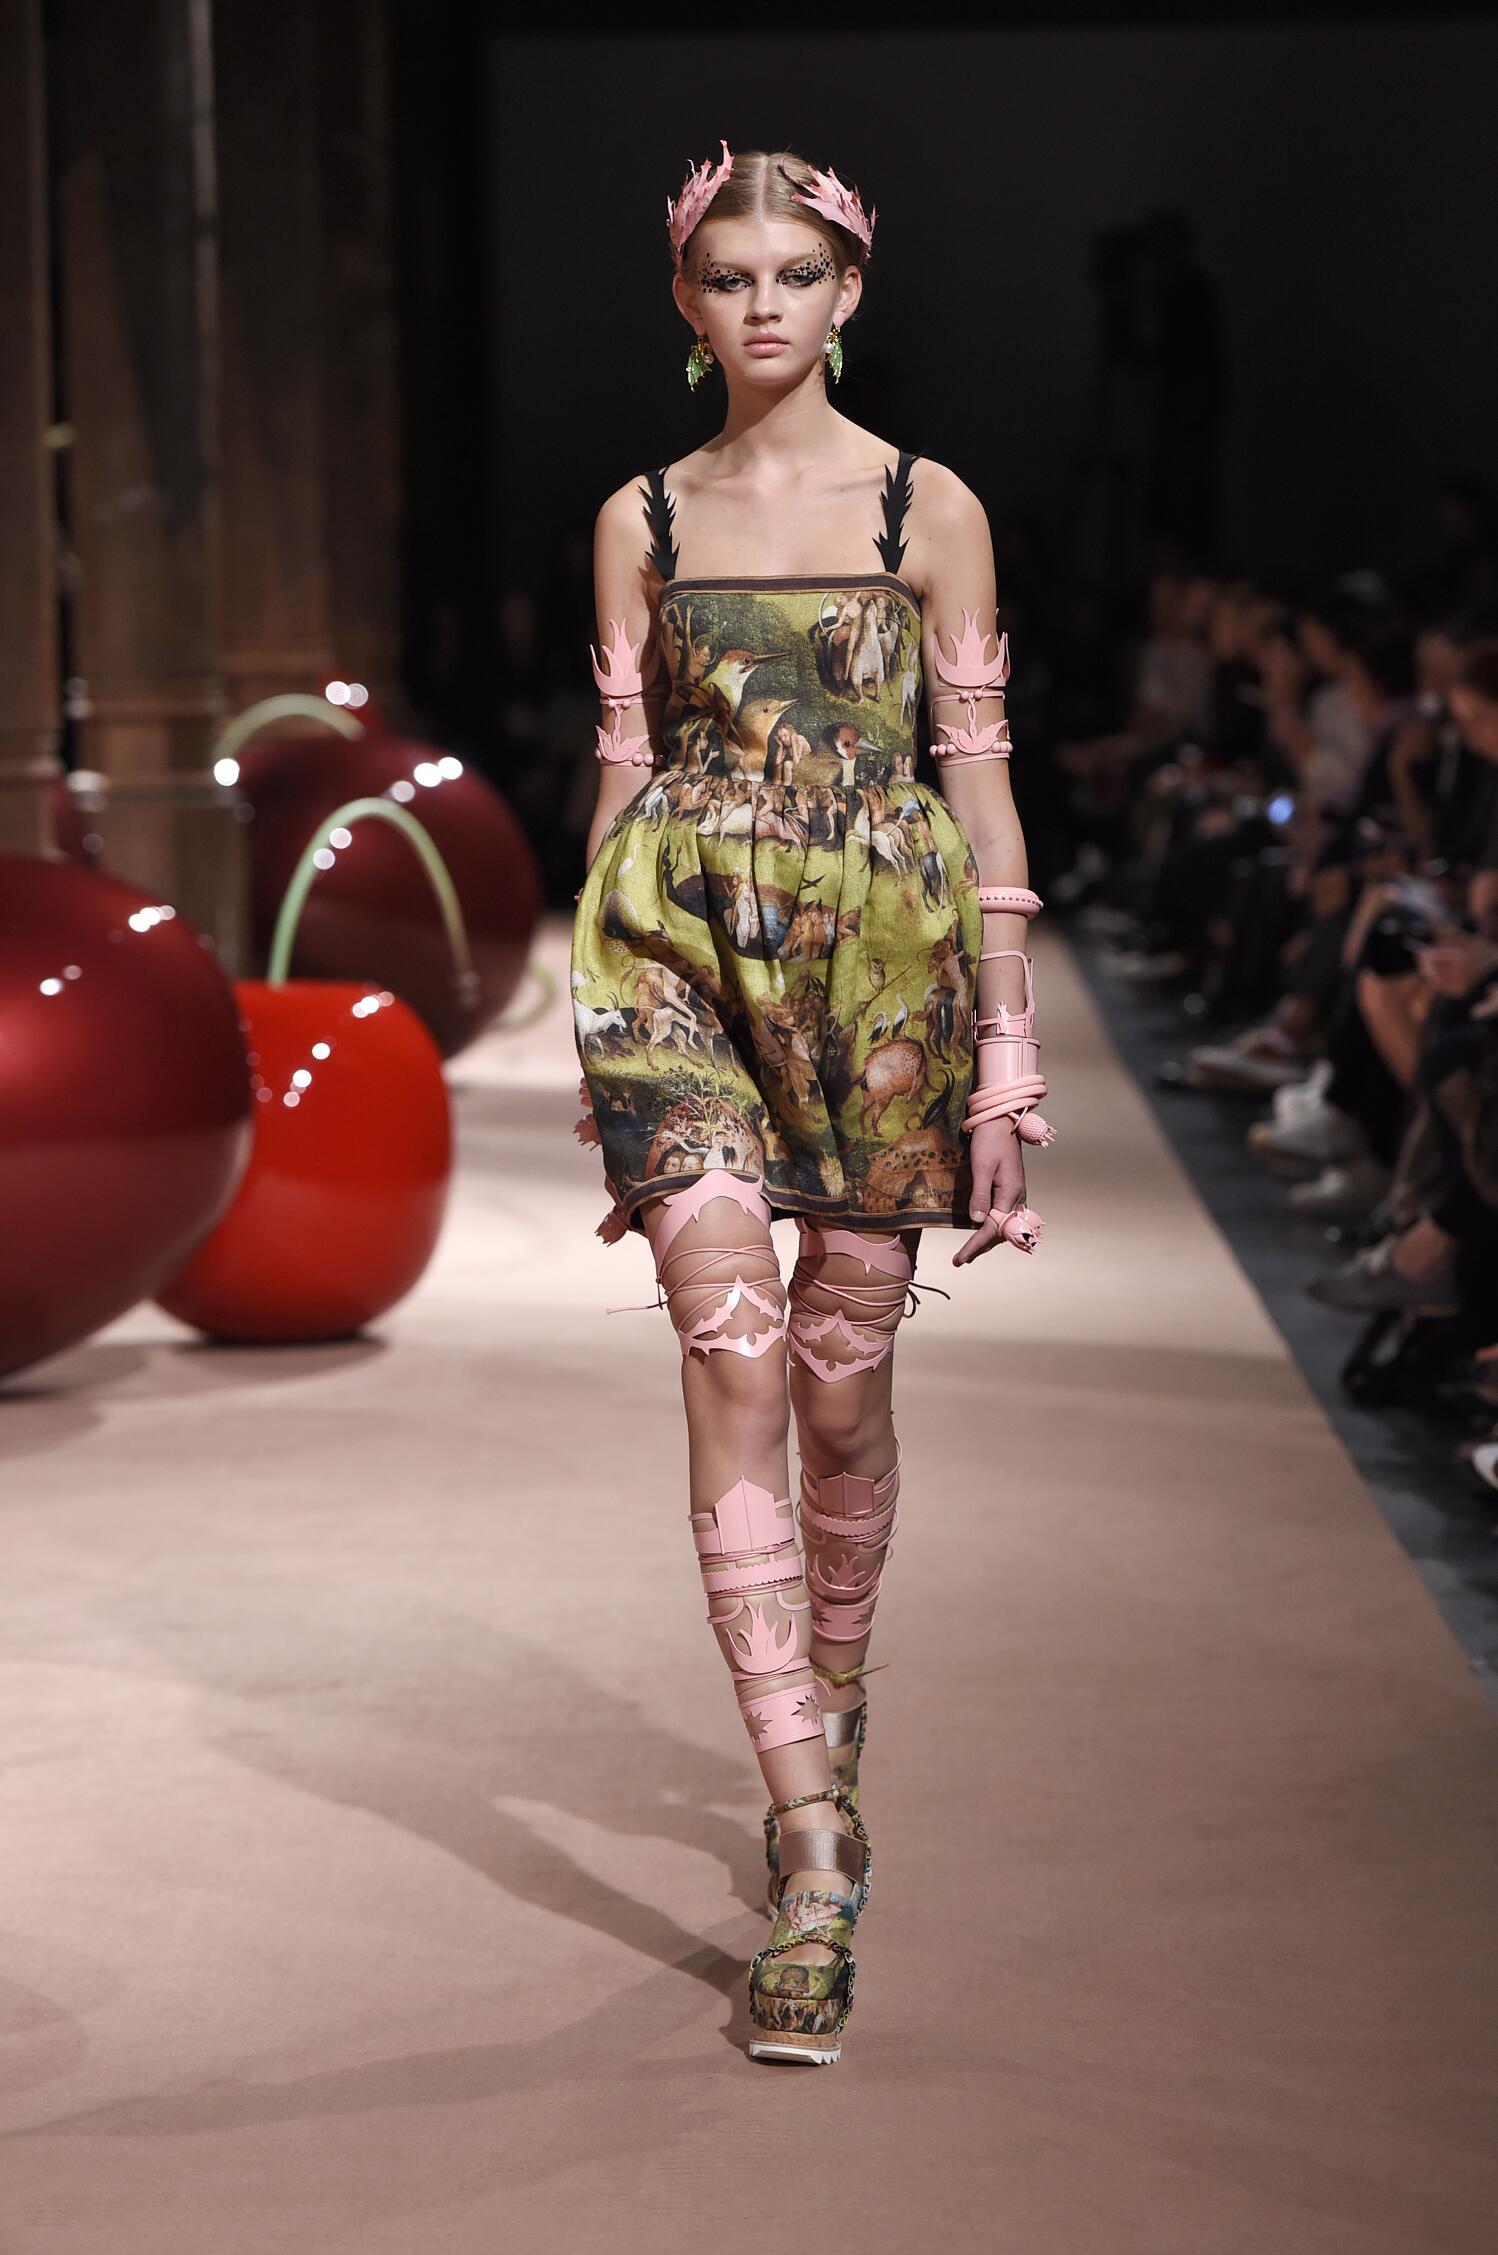 Catwalk Undercover Woman Fashion Show Summer 2015